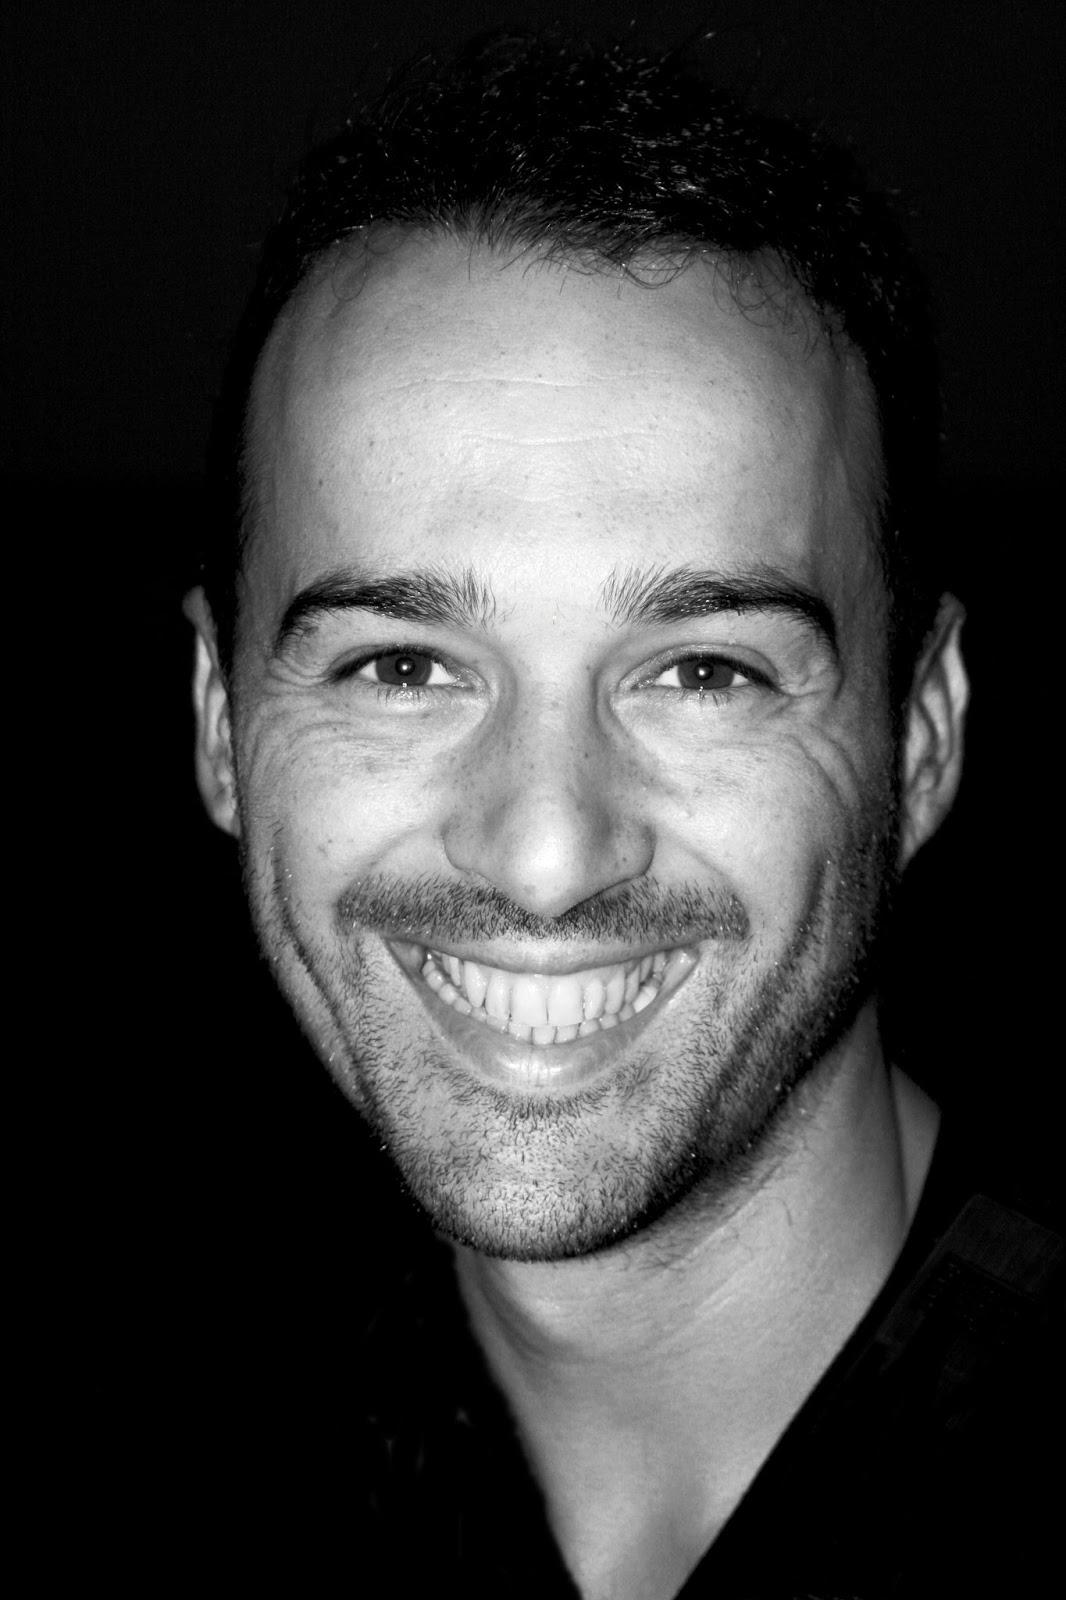 enBABIA. Revista digital. Fuerteventura.: Entrevista a Javier Bolea